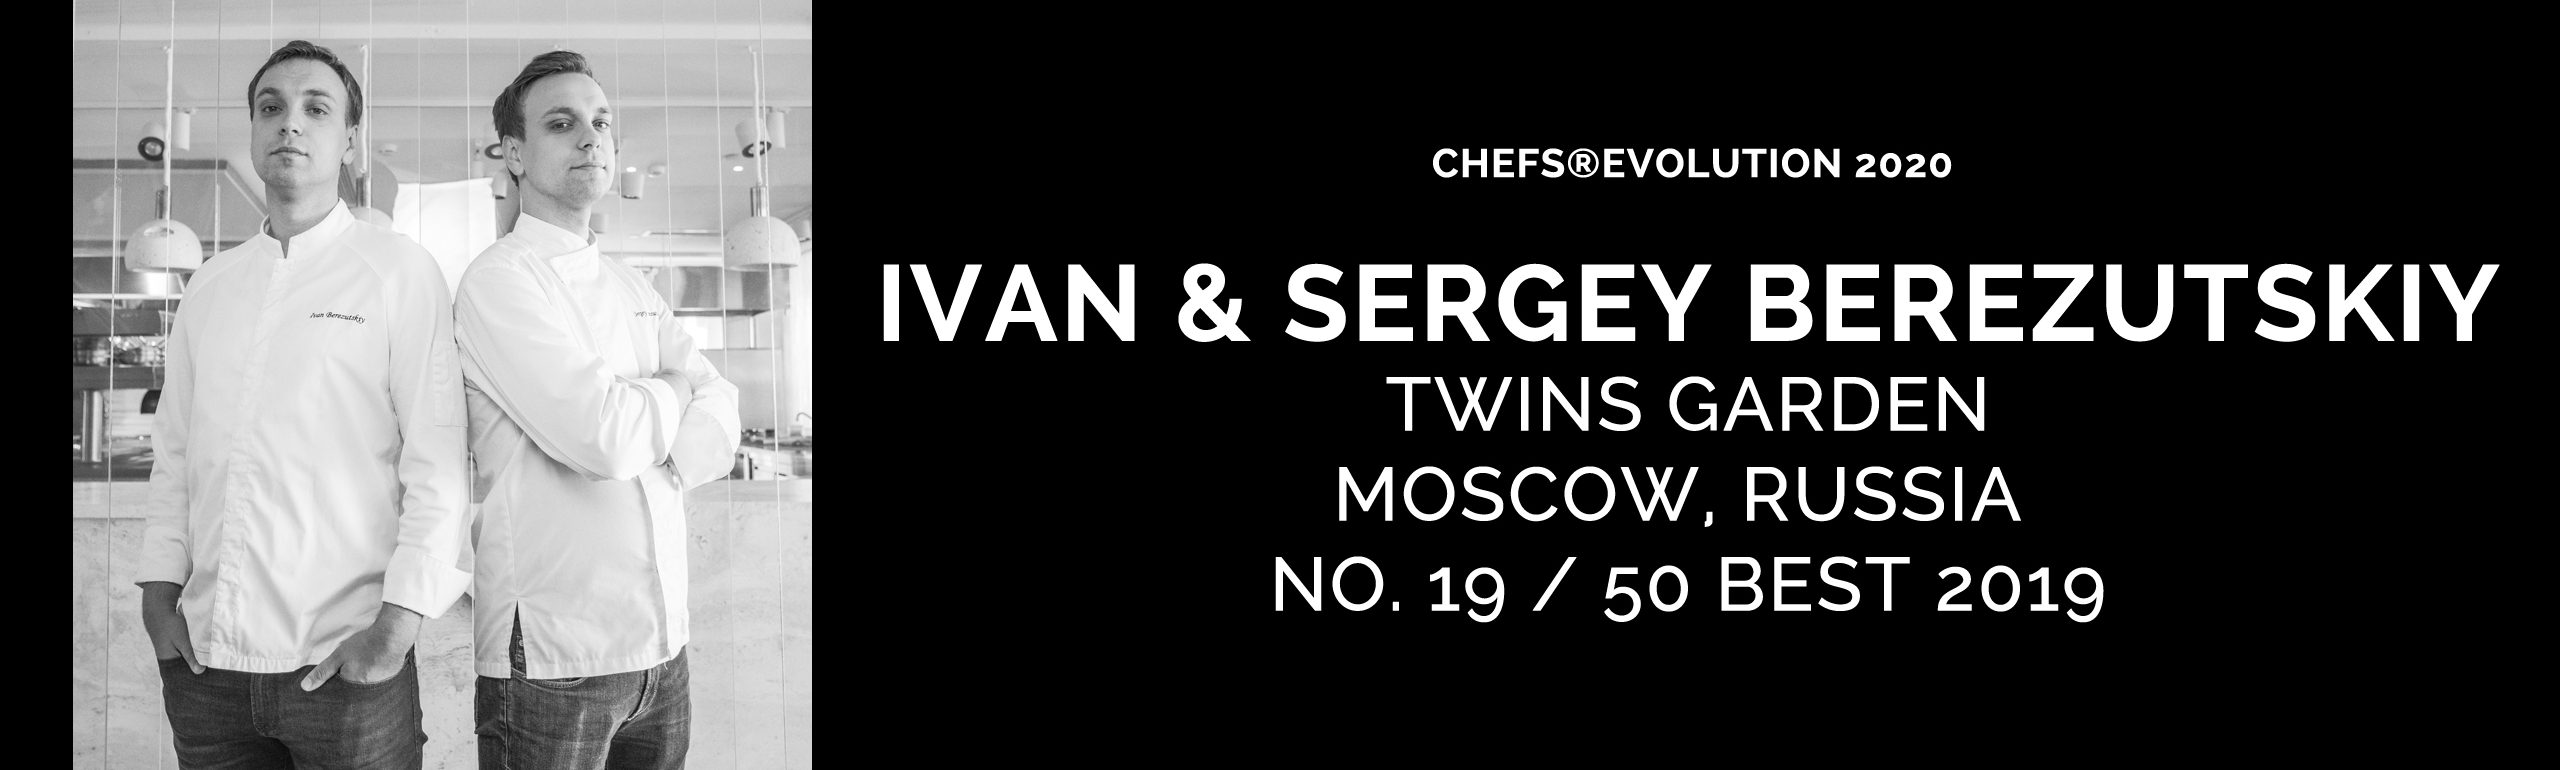 Ivan & Sergey Berezutskiy